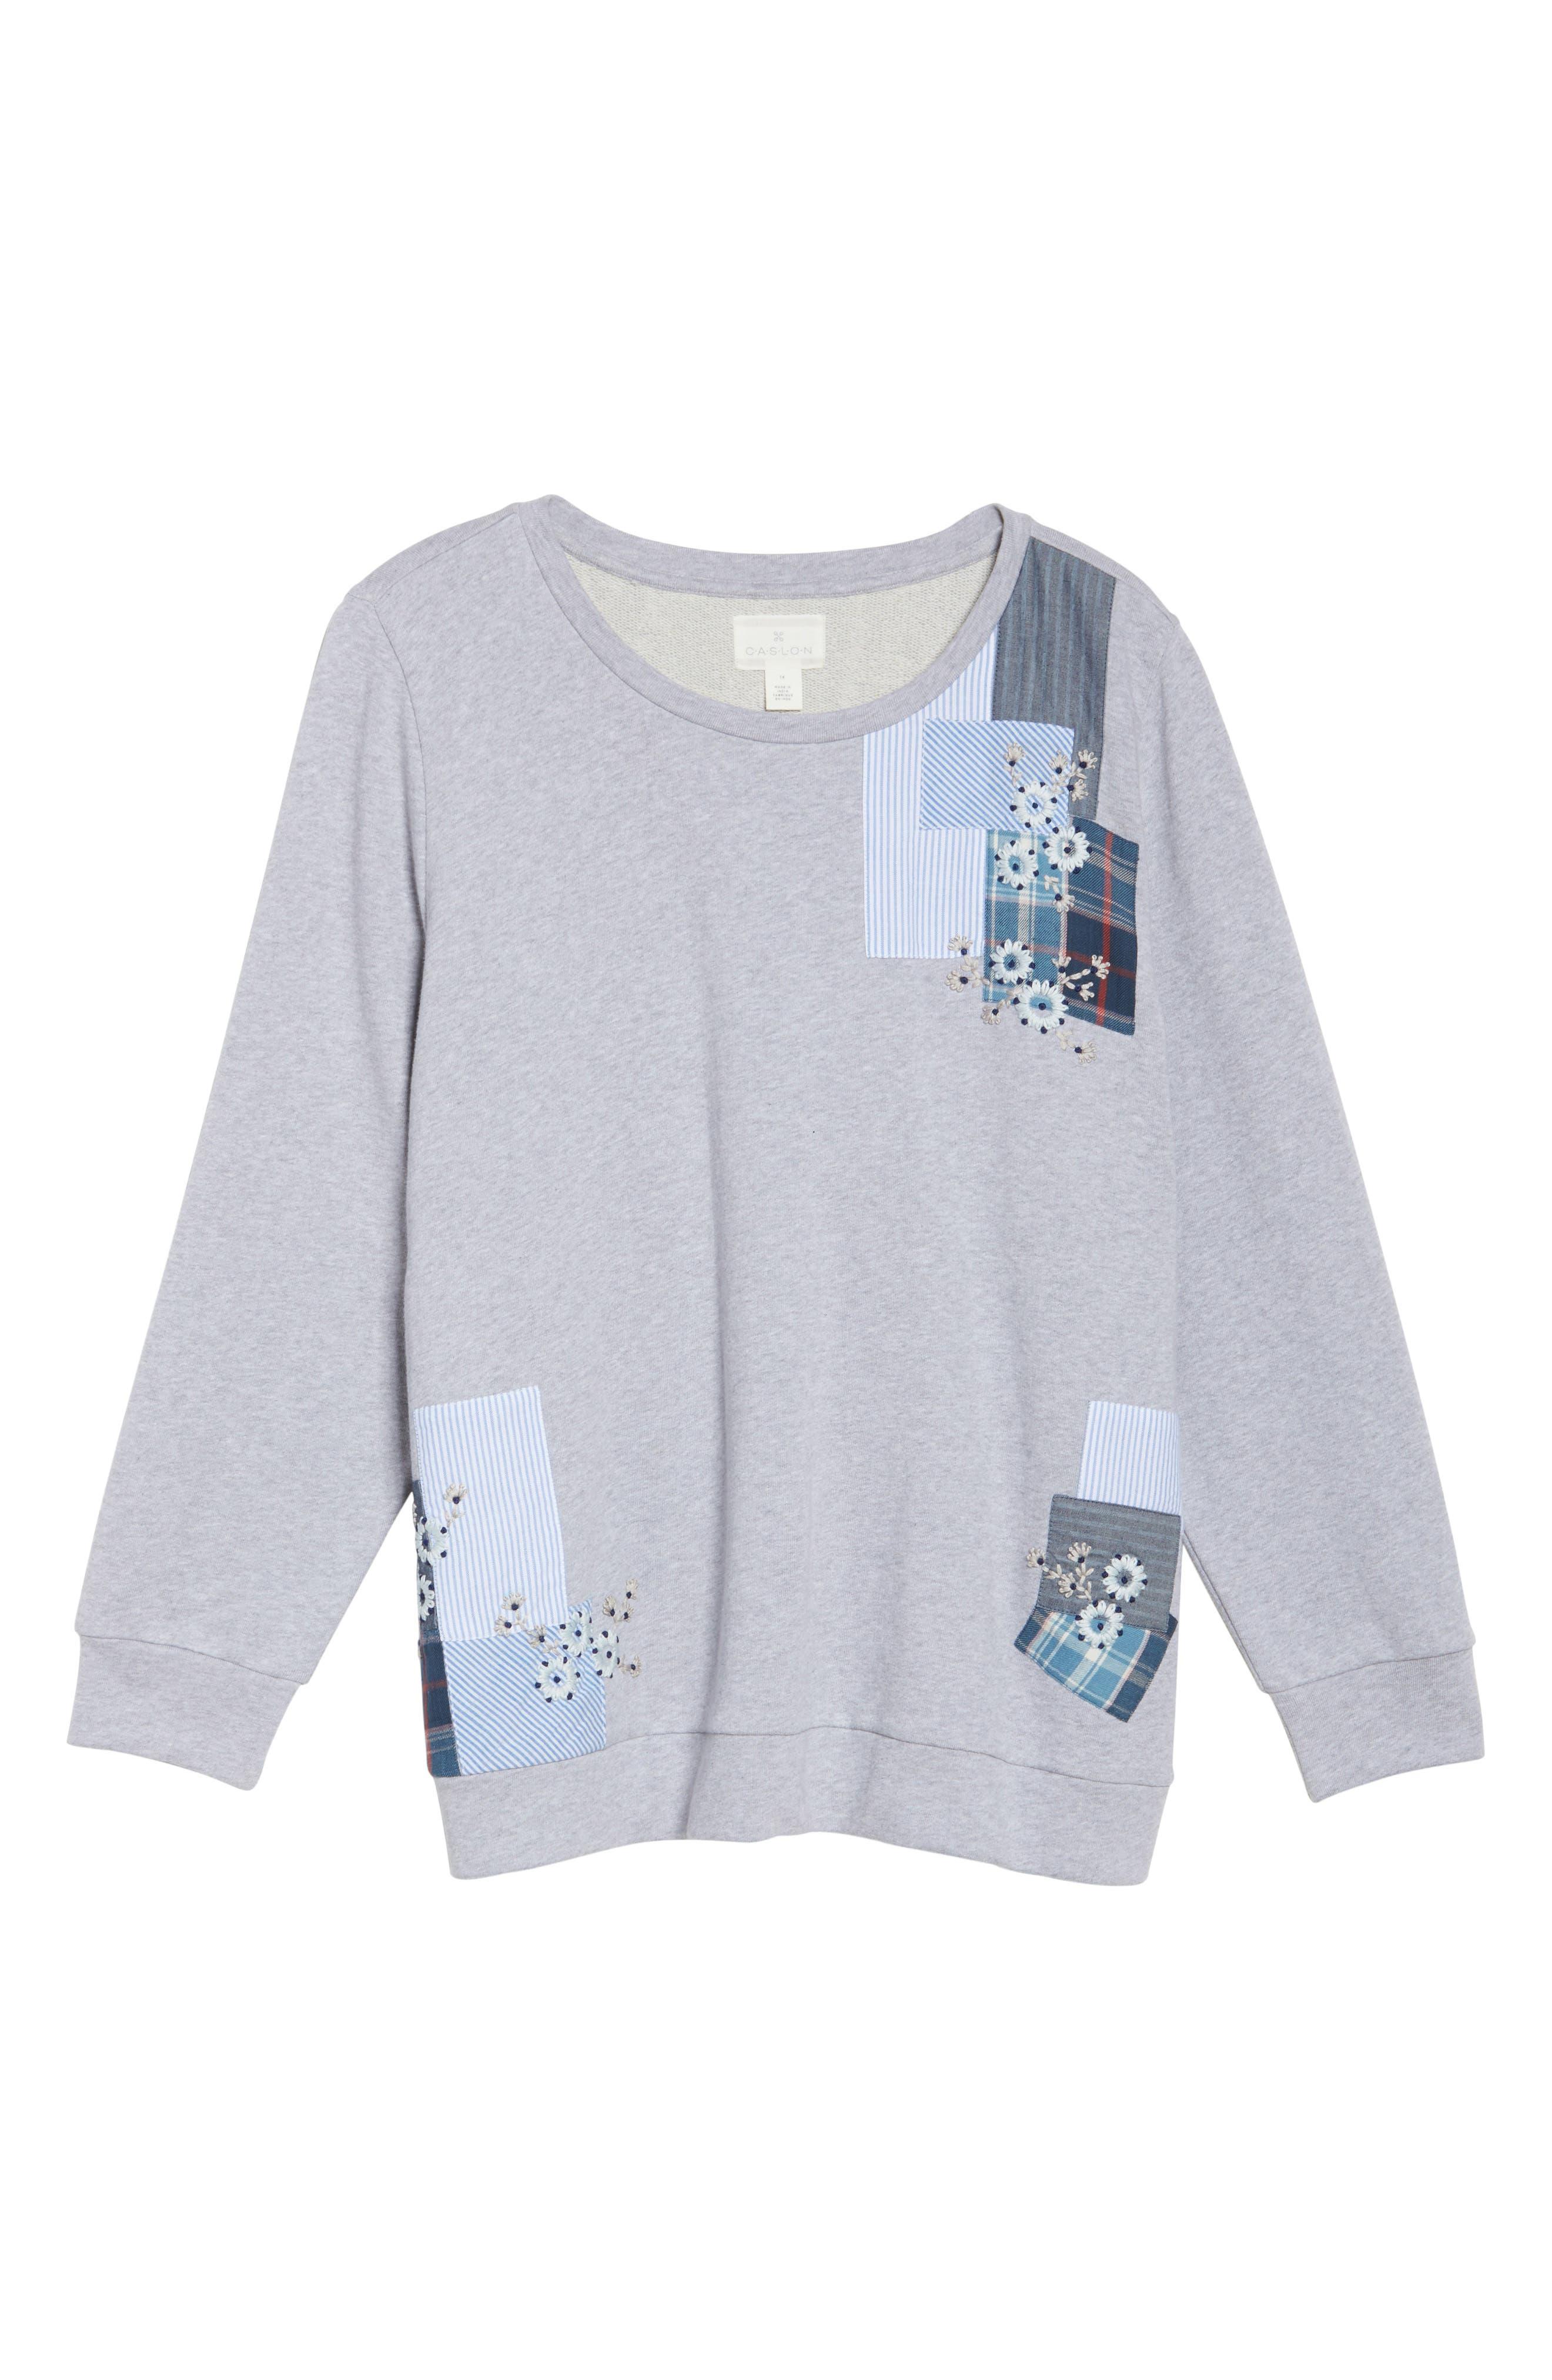 Patchwork Sweatshirt,                             Alternate thumbnail 6, color,                             Grey Floral